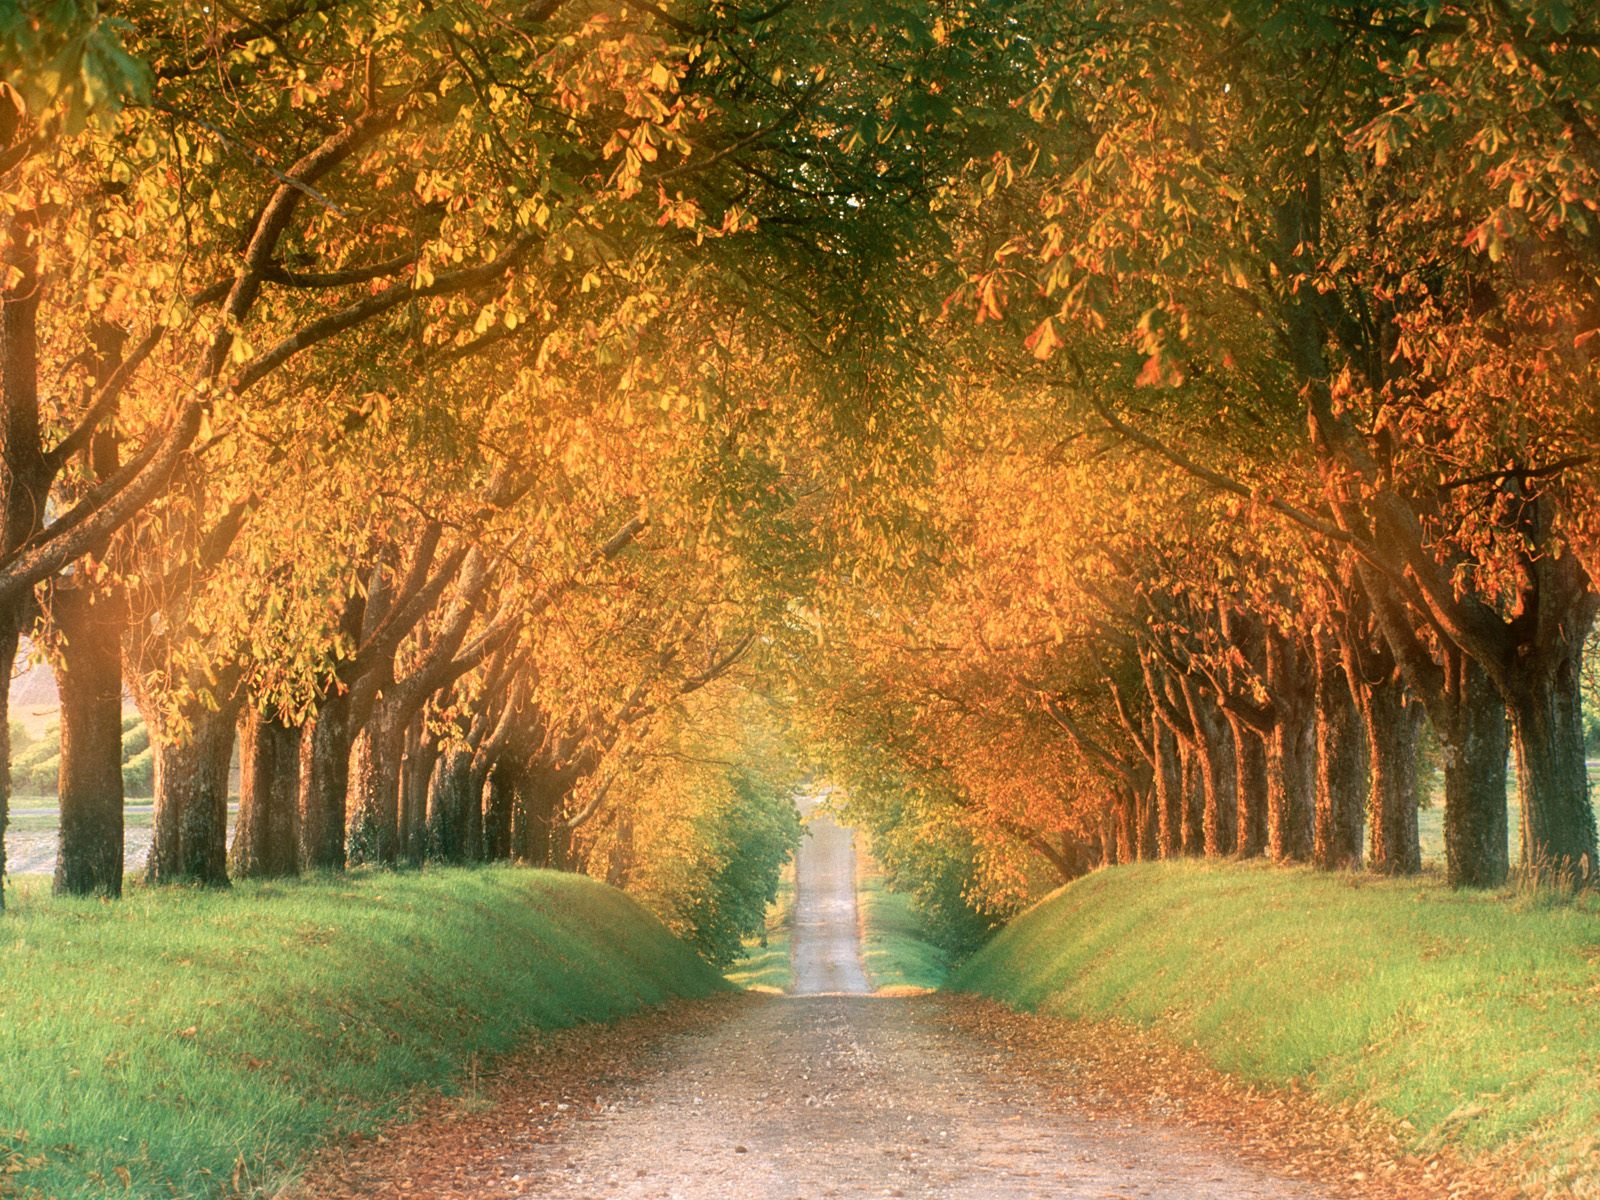 http://4.bp.blogspot.com/-pjUx45EqA9s/TVqcrbRVK7I/AAAAAAAAAMI/pVXS46GGap8/s1600/autumn_road%252C_cognac_region%252C_france.jpg